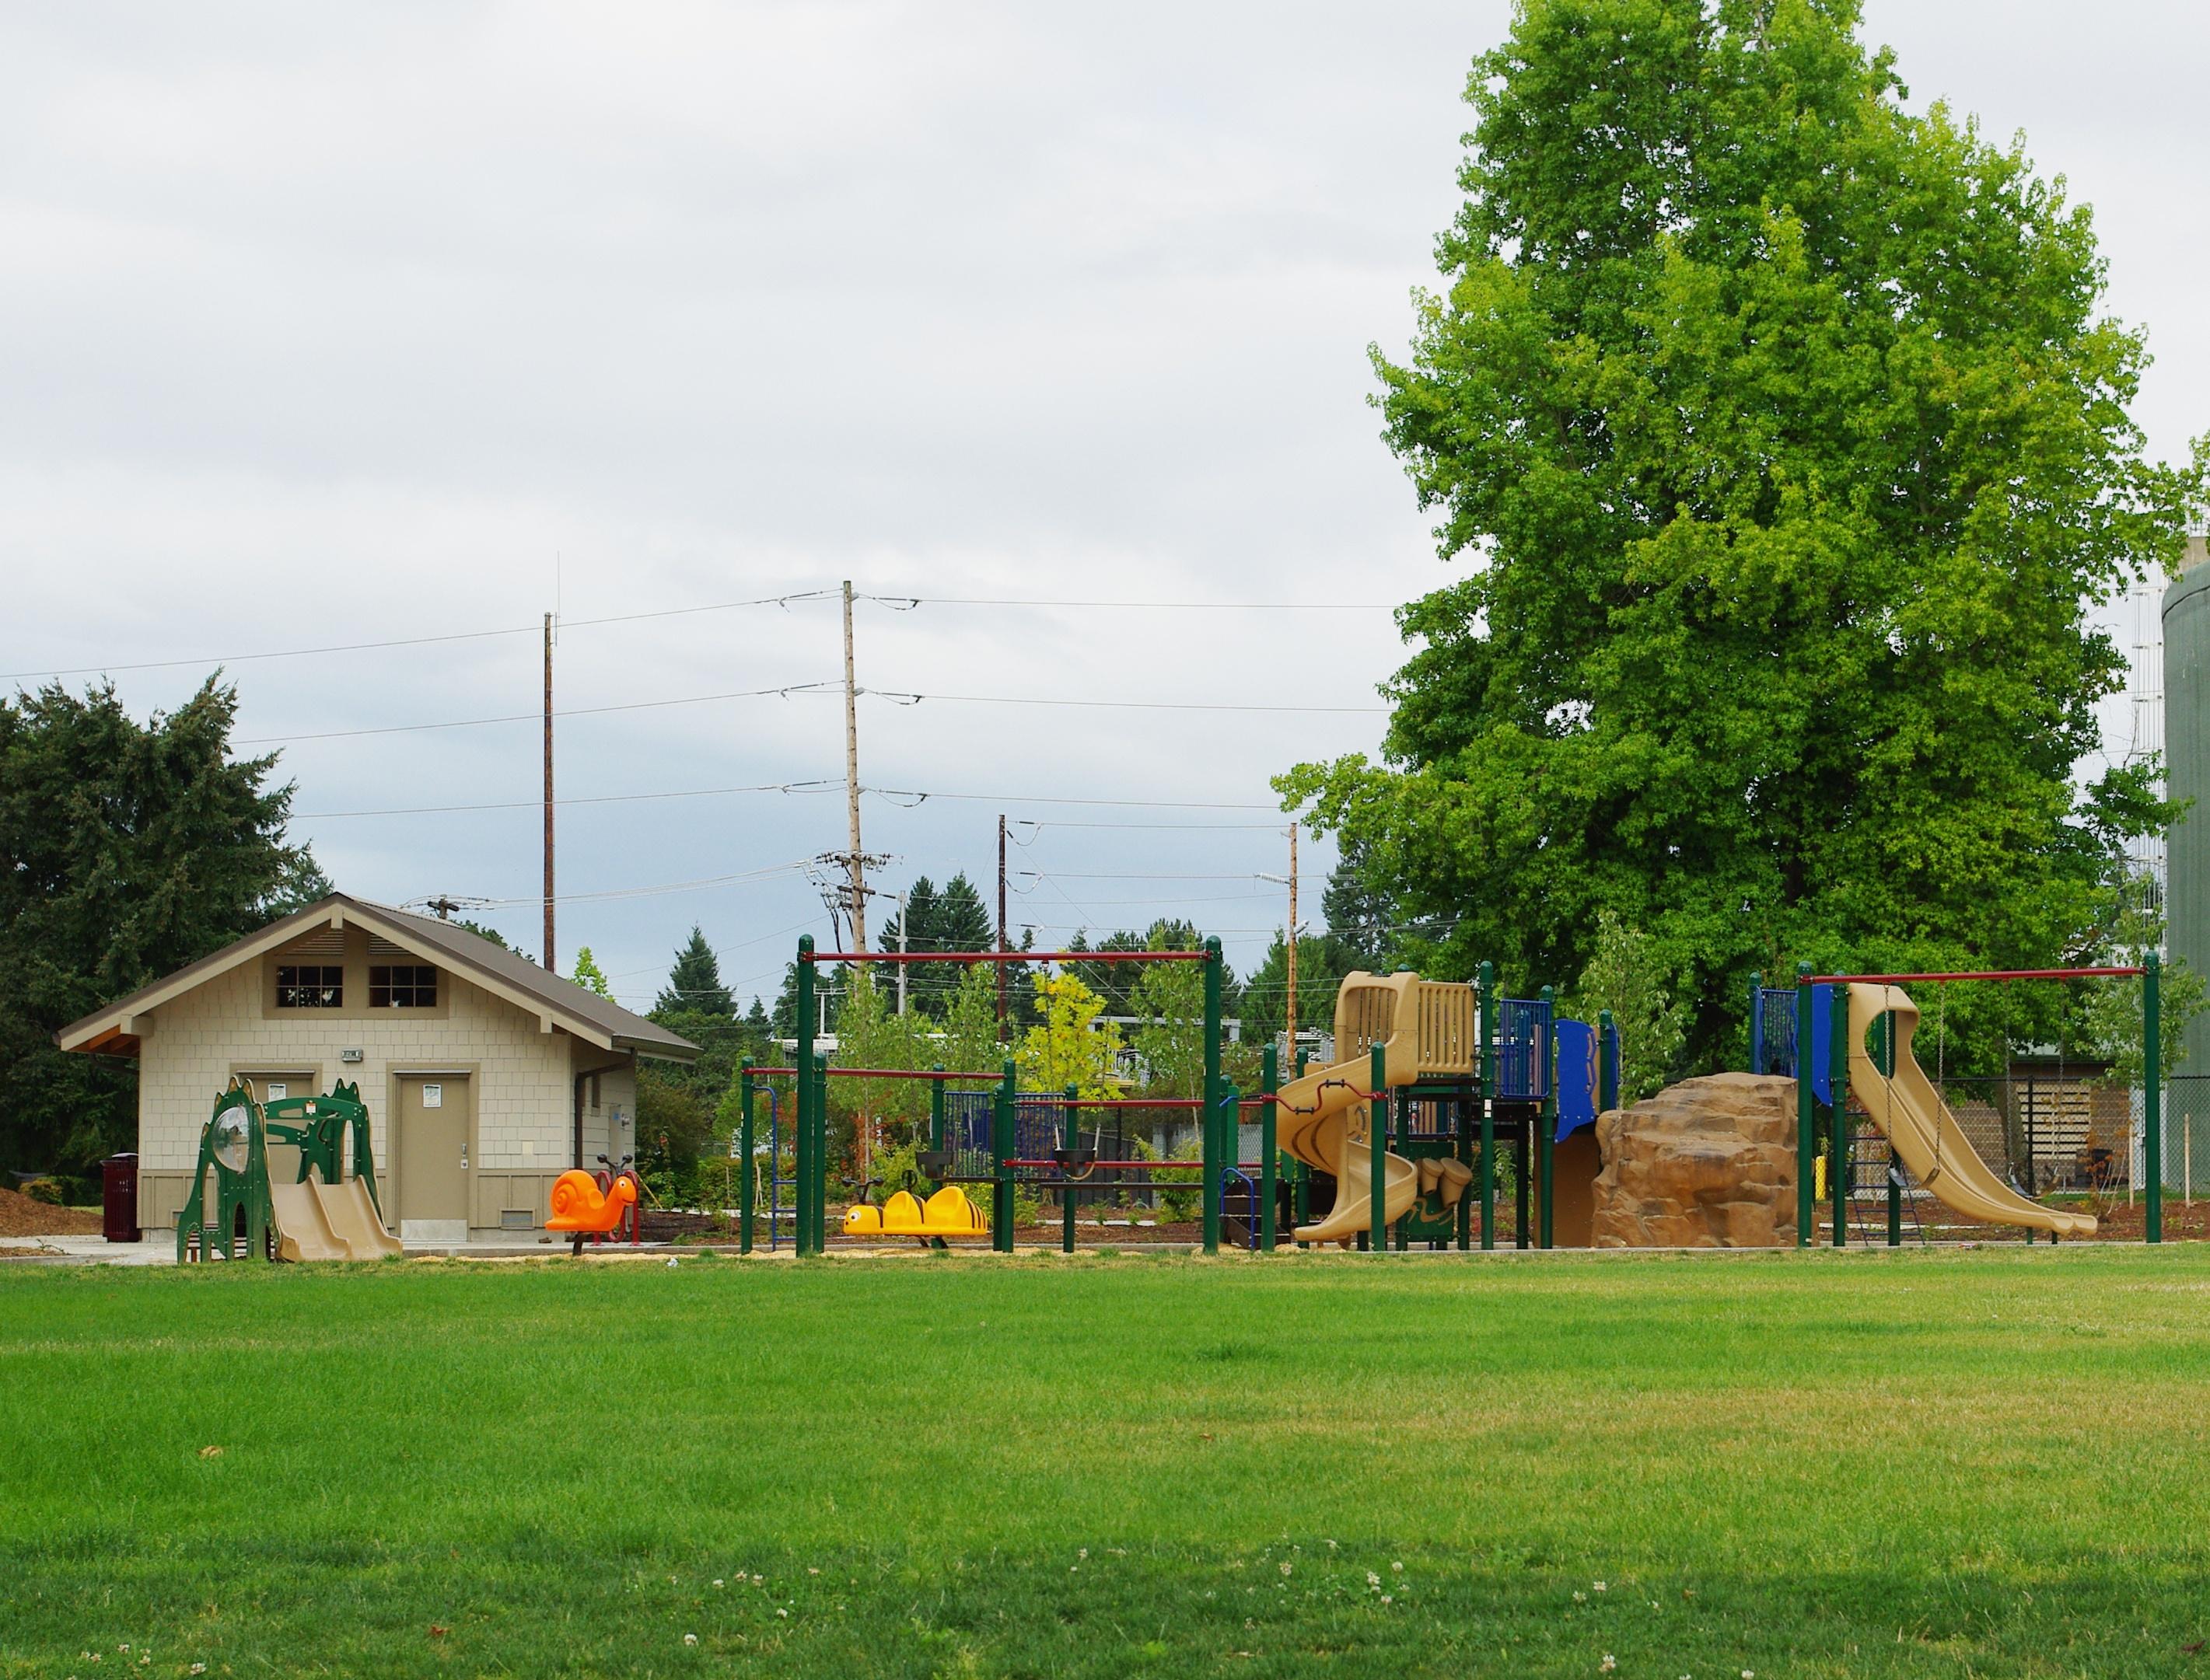 FileBicentennial Park Playground